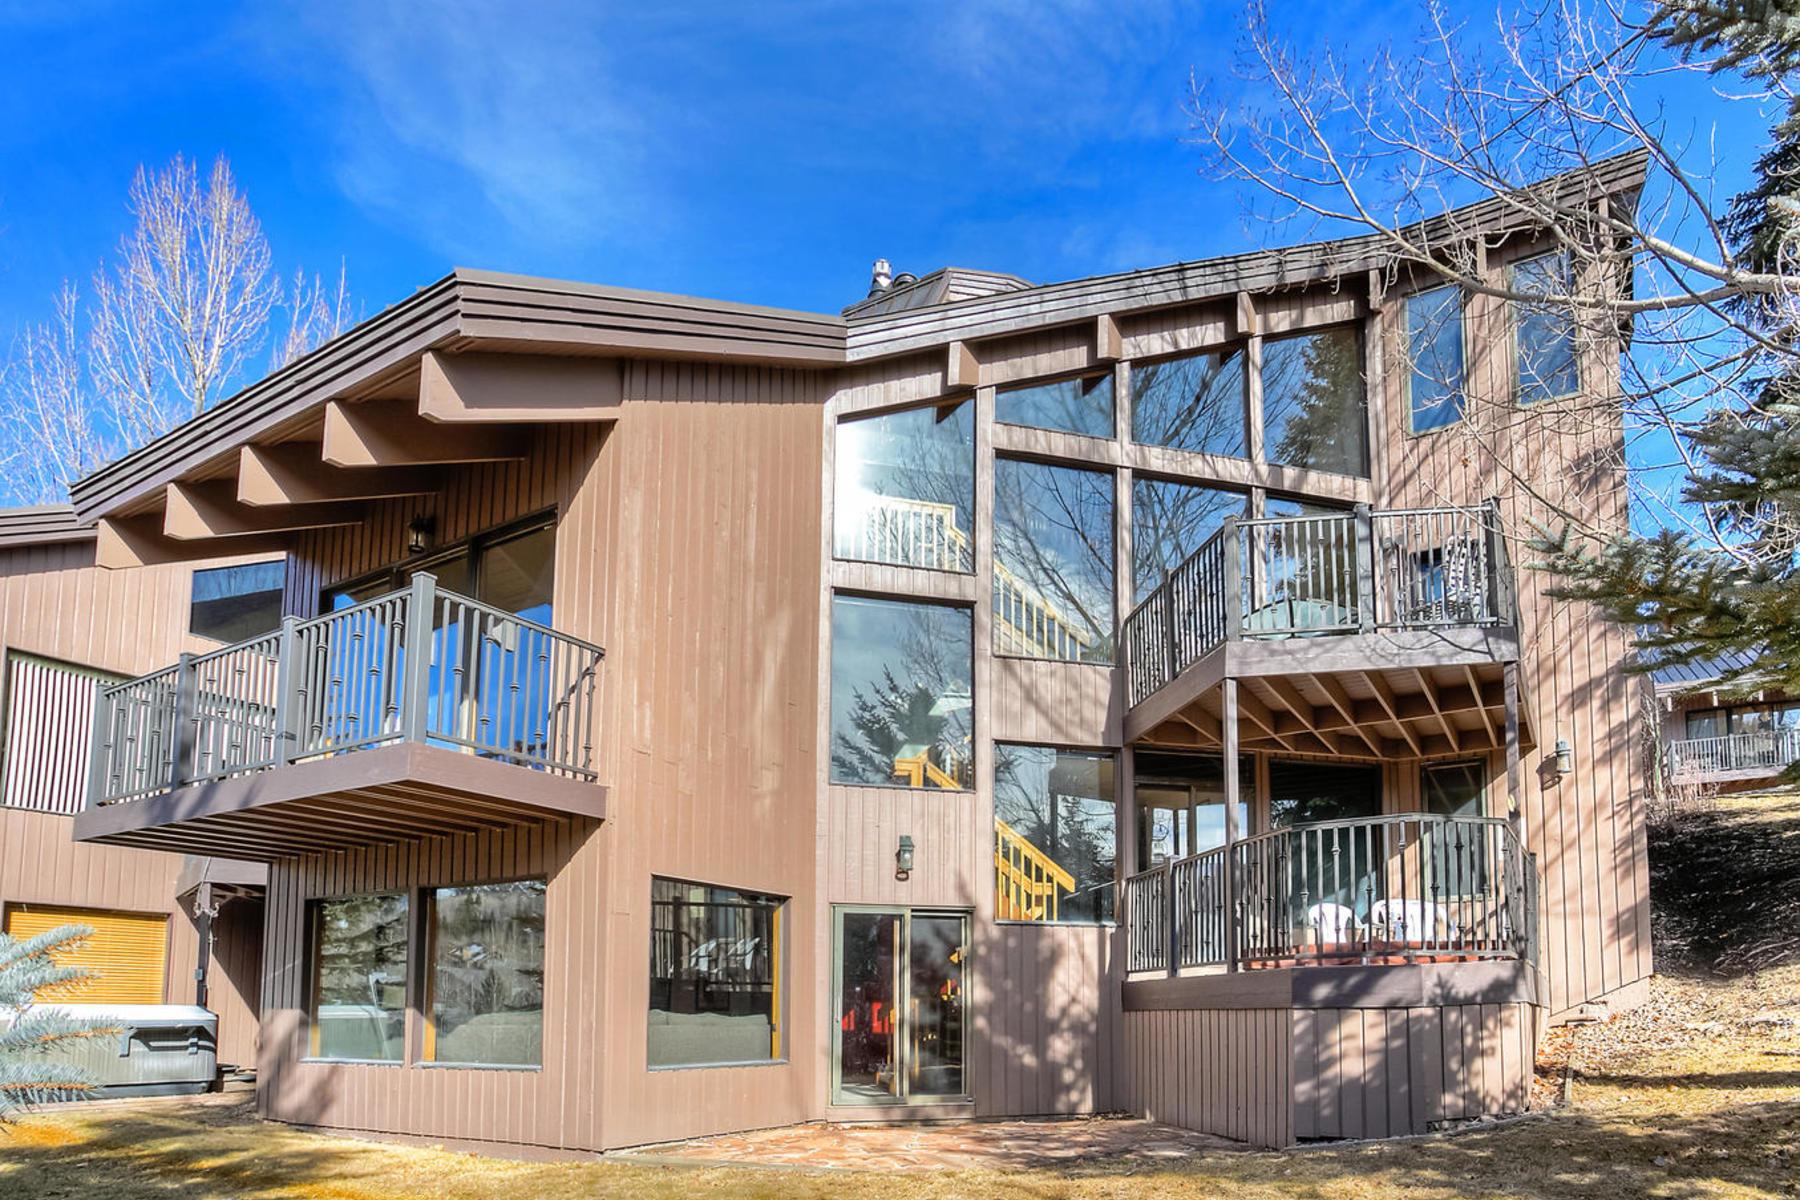 Stadthaus für Verkauf beim Fabulous and Sunny Deer Valley Mountain Townhome with Postcard Views 1240 Pinnacle Dr #14 Park City, Utah, 84060 Vereinigte Staaten